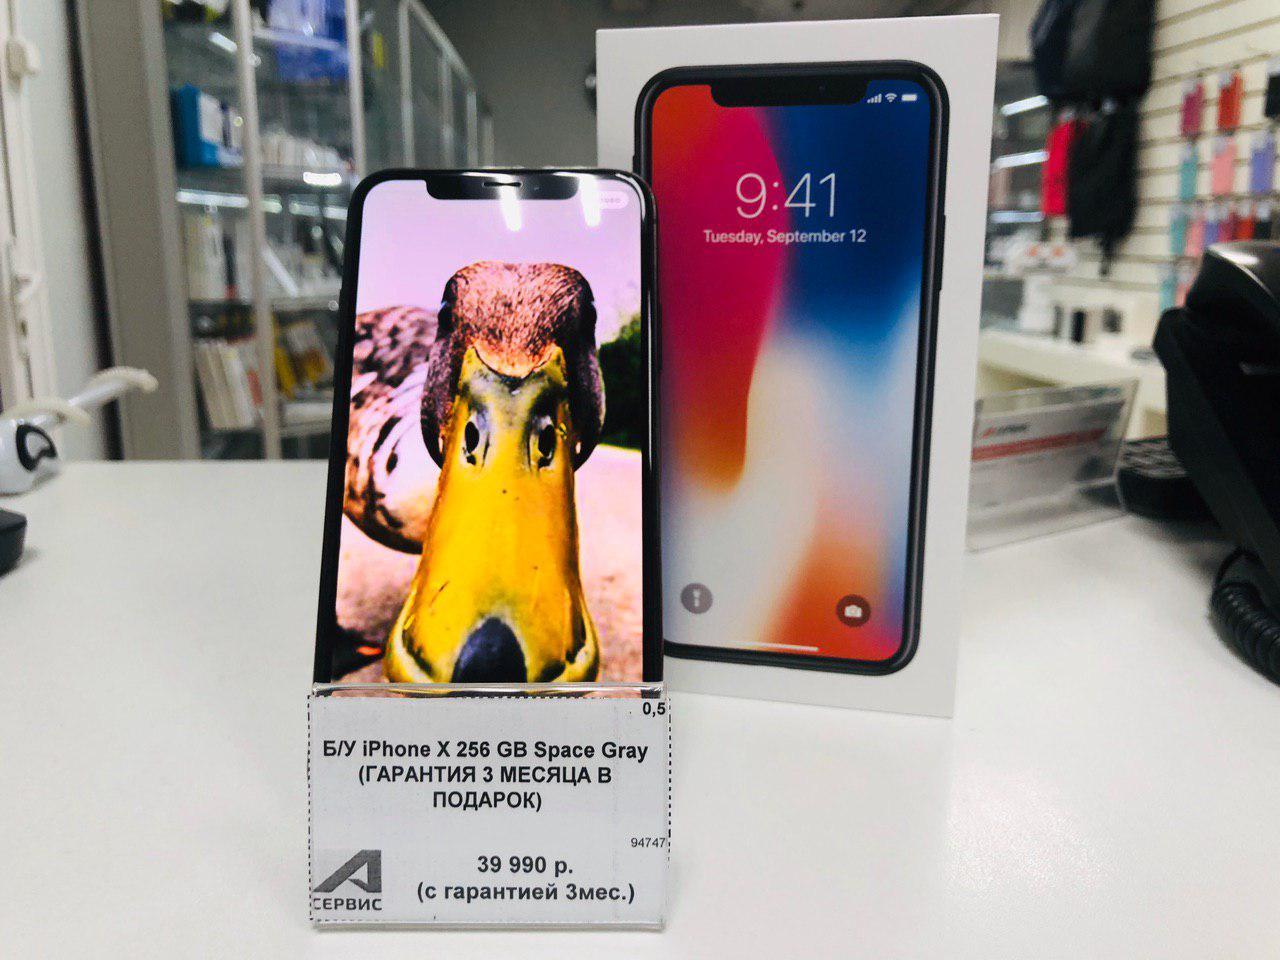 Б/У iPhone X 256 GB Space Gray (ГАРАНТИЯ 3 МЕСЯЦА В ПОДАРОК)